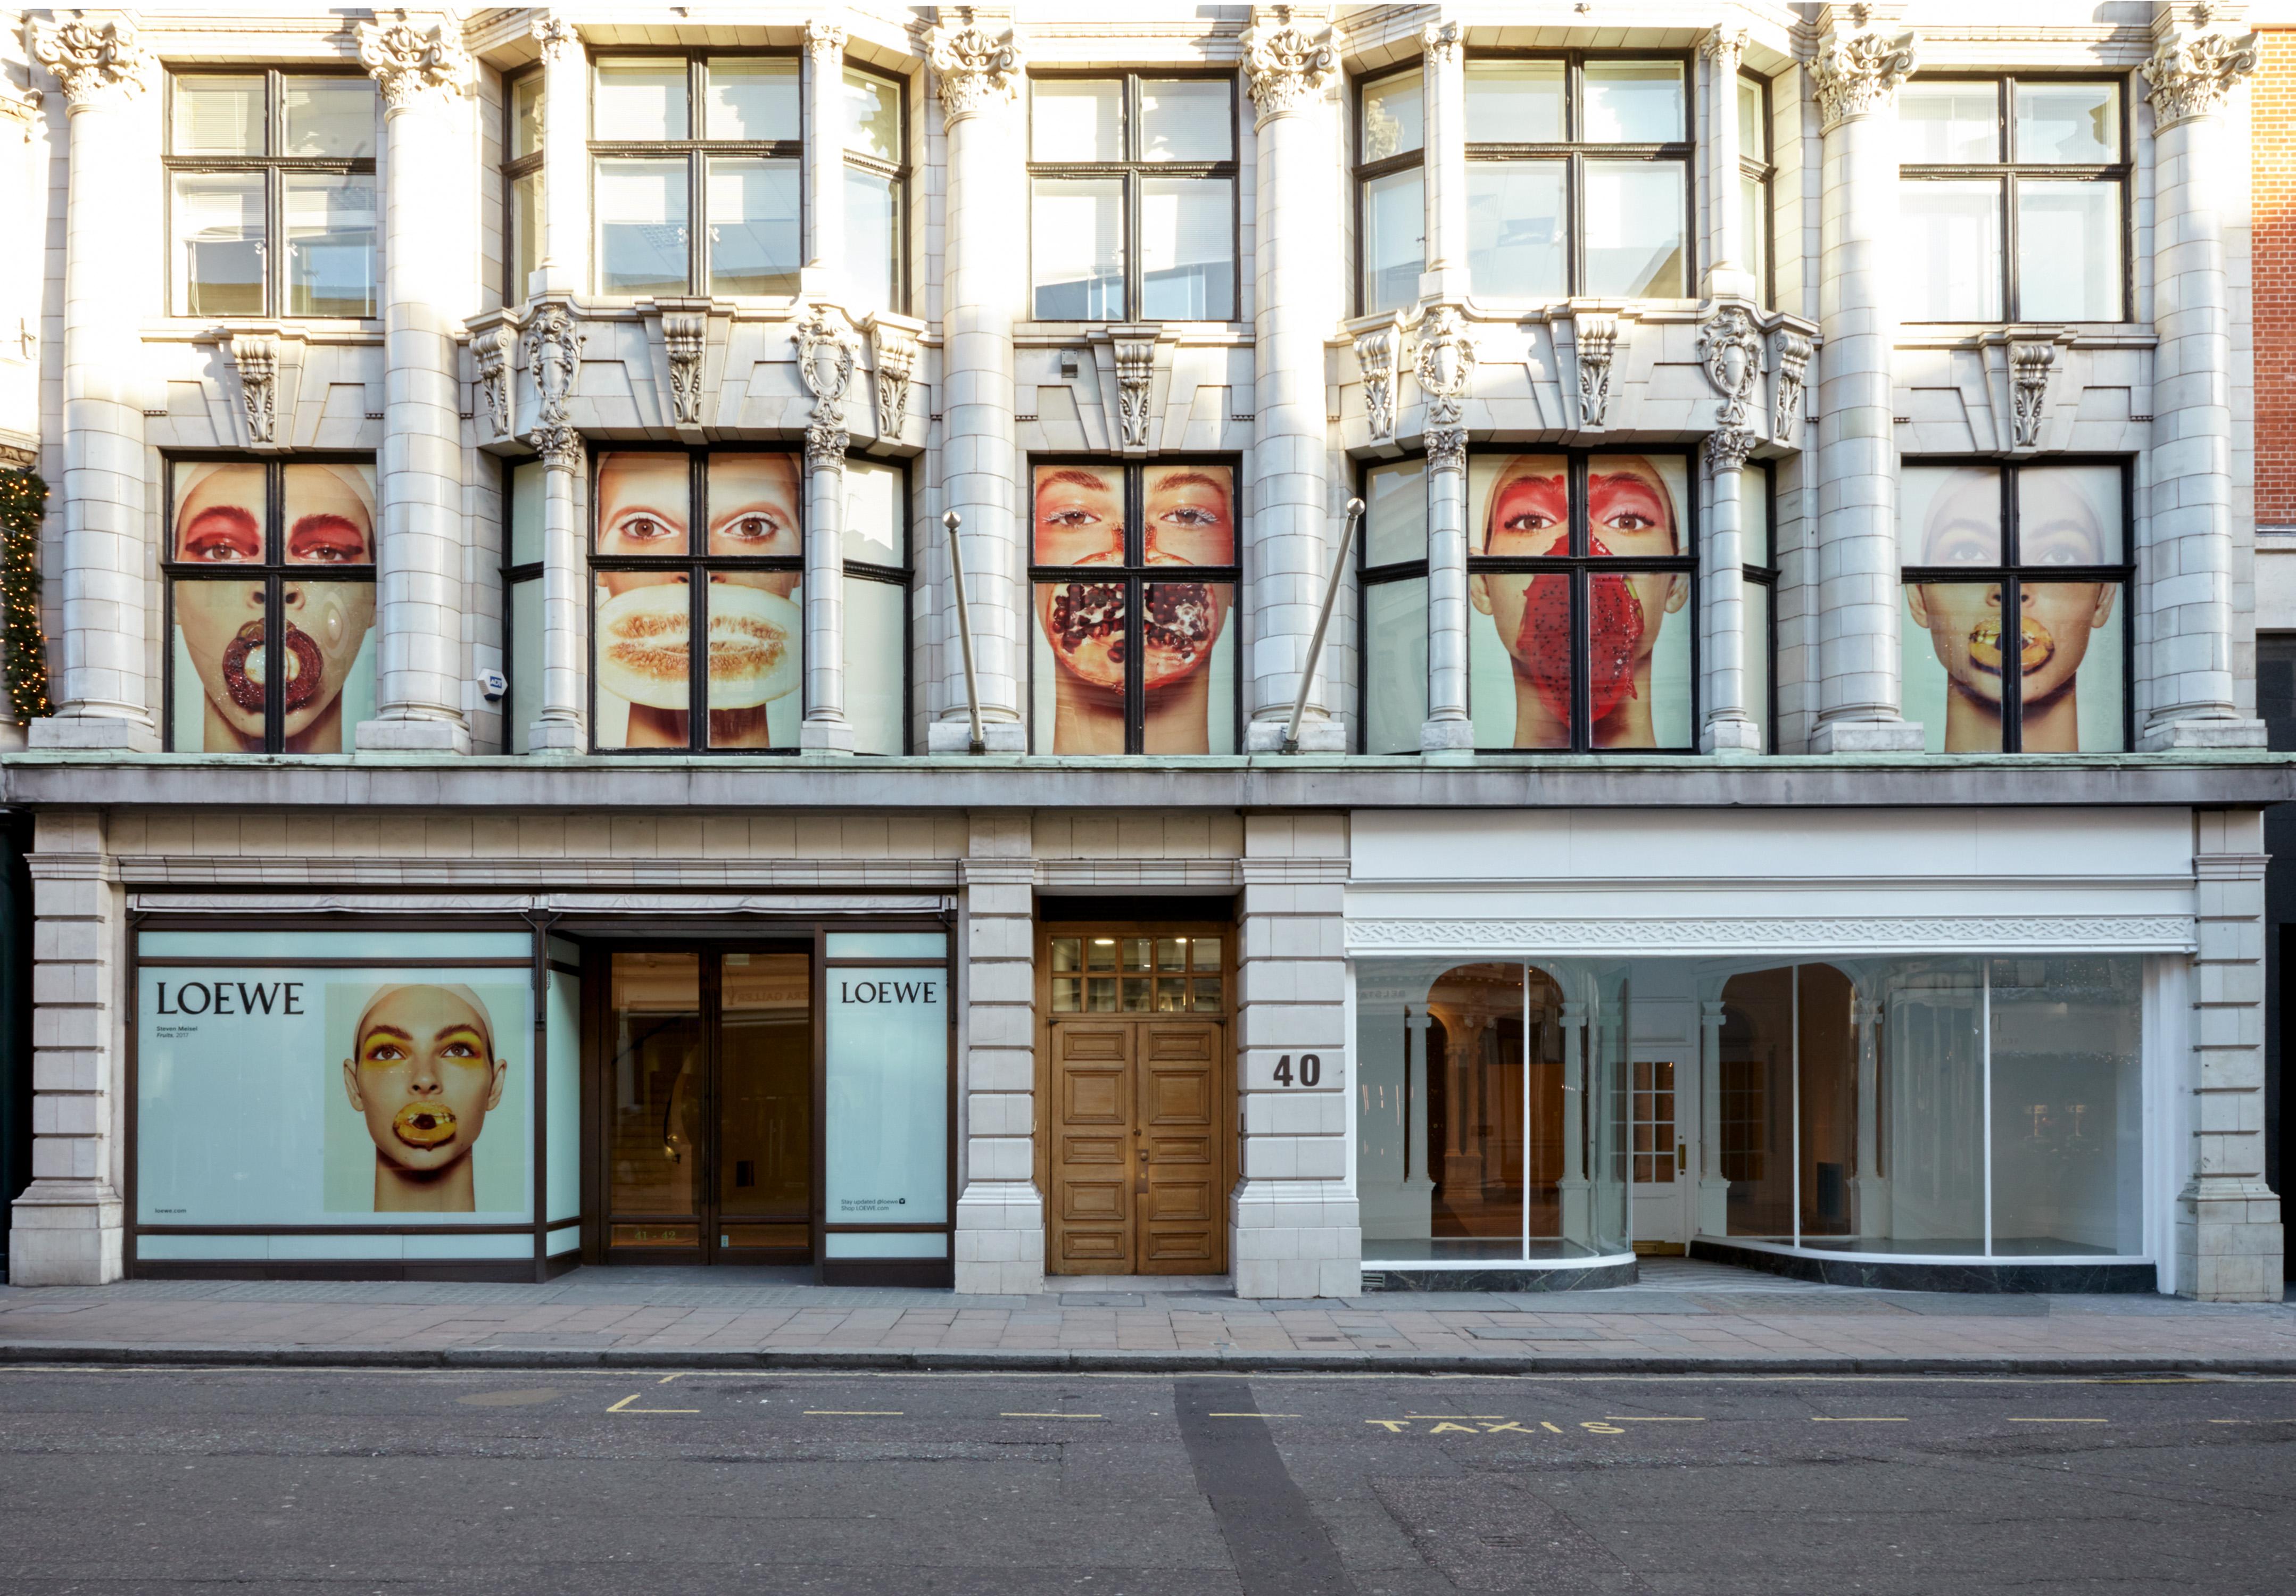 The new Loewe store location on New Bond Street, London